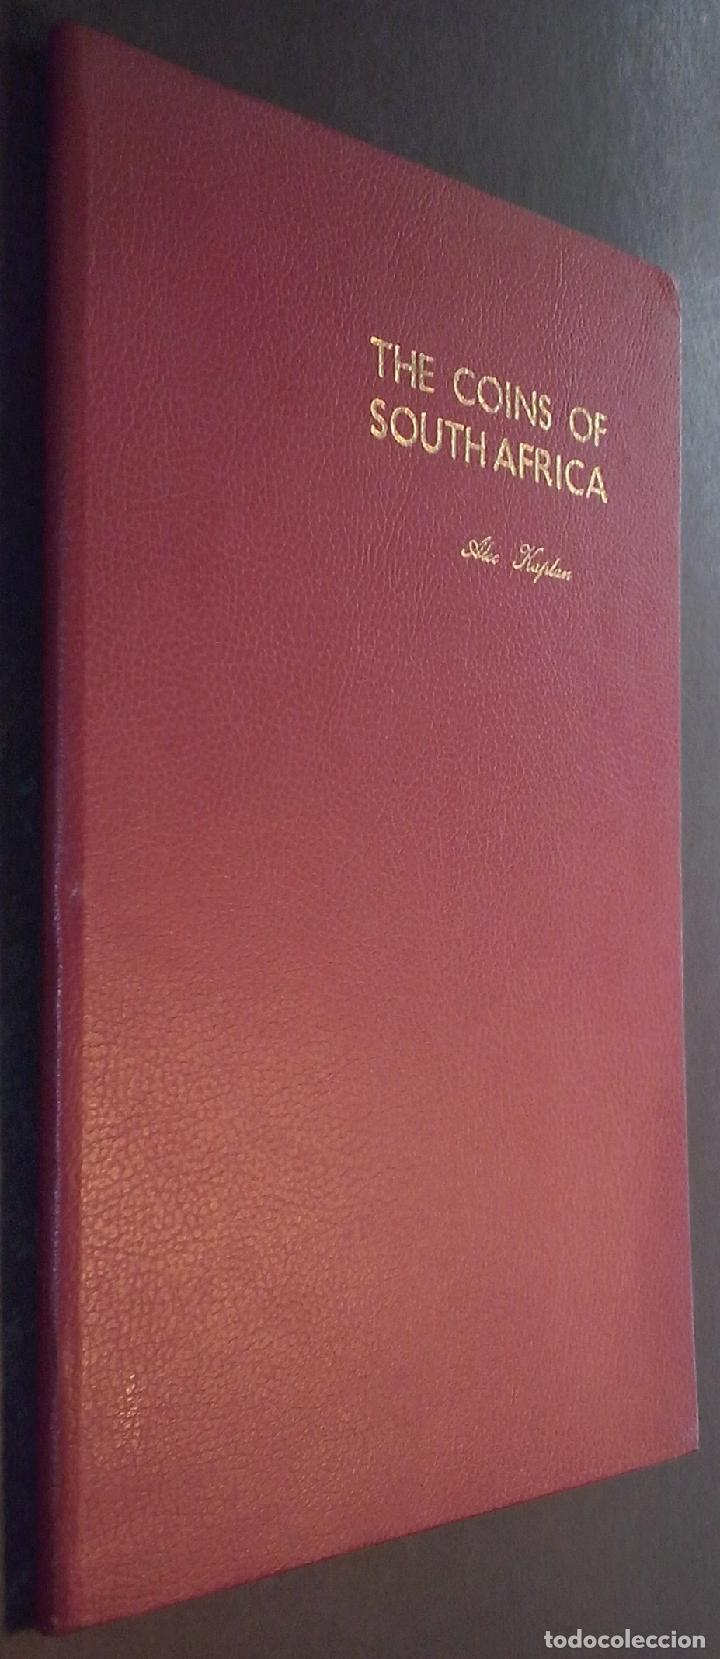 Catalogue of the Coins of South Africa - KAPLAN, Alec segunda mano